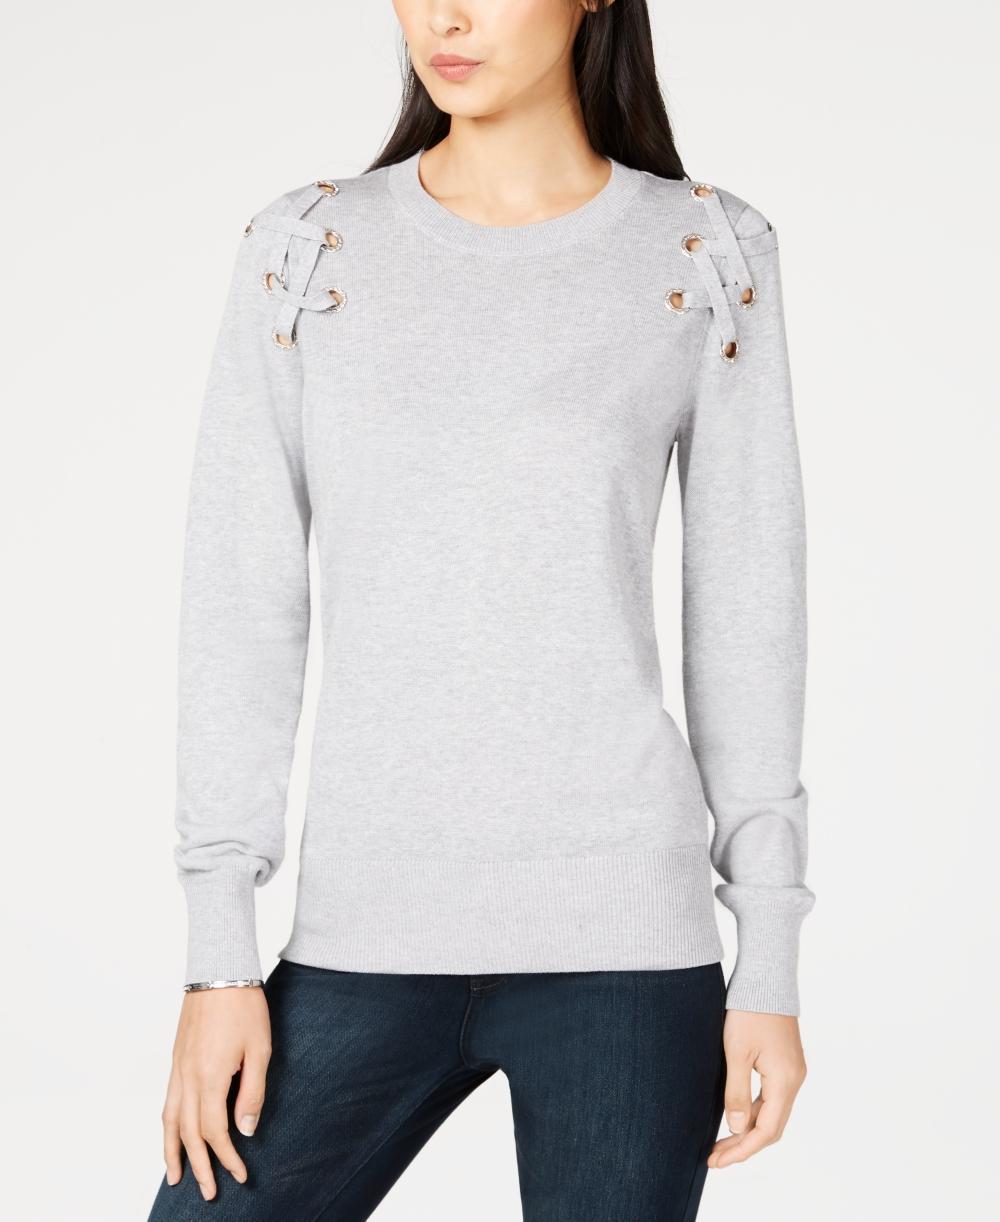 d288783cf04 MICHAEL KORS  88 NEW 24444 Lace-Up Sweater Womens Top L 192877195931 ...